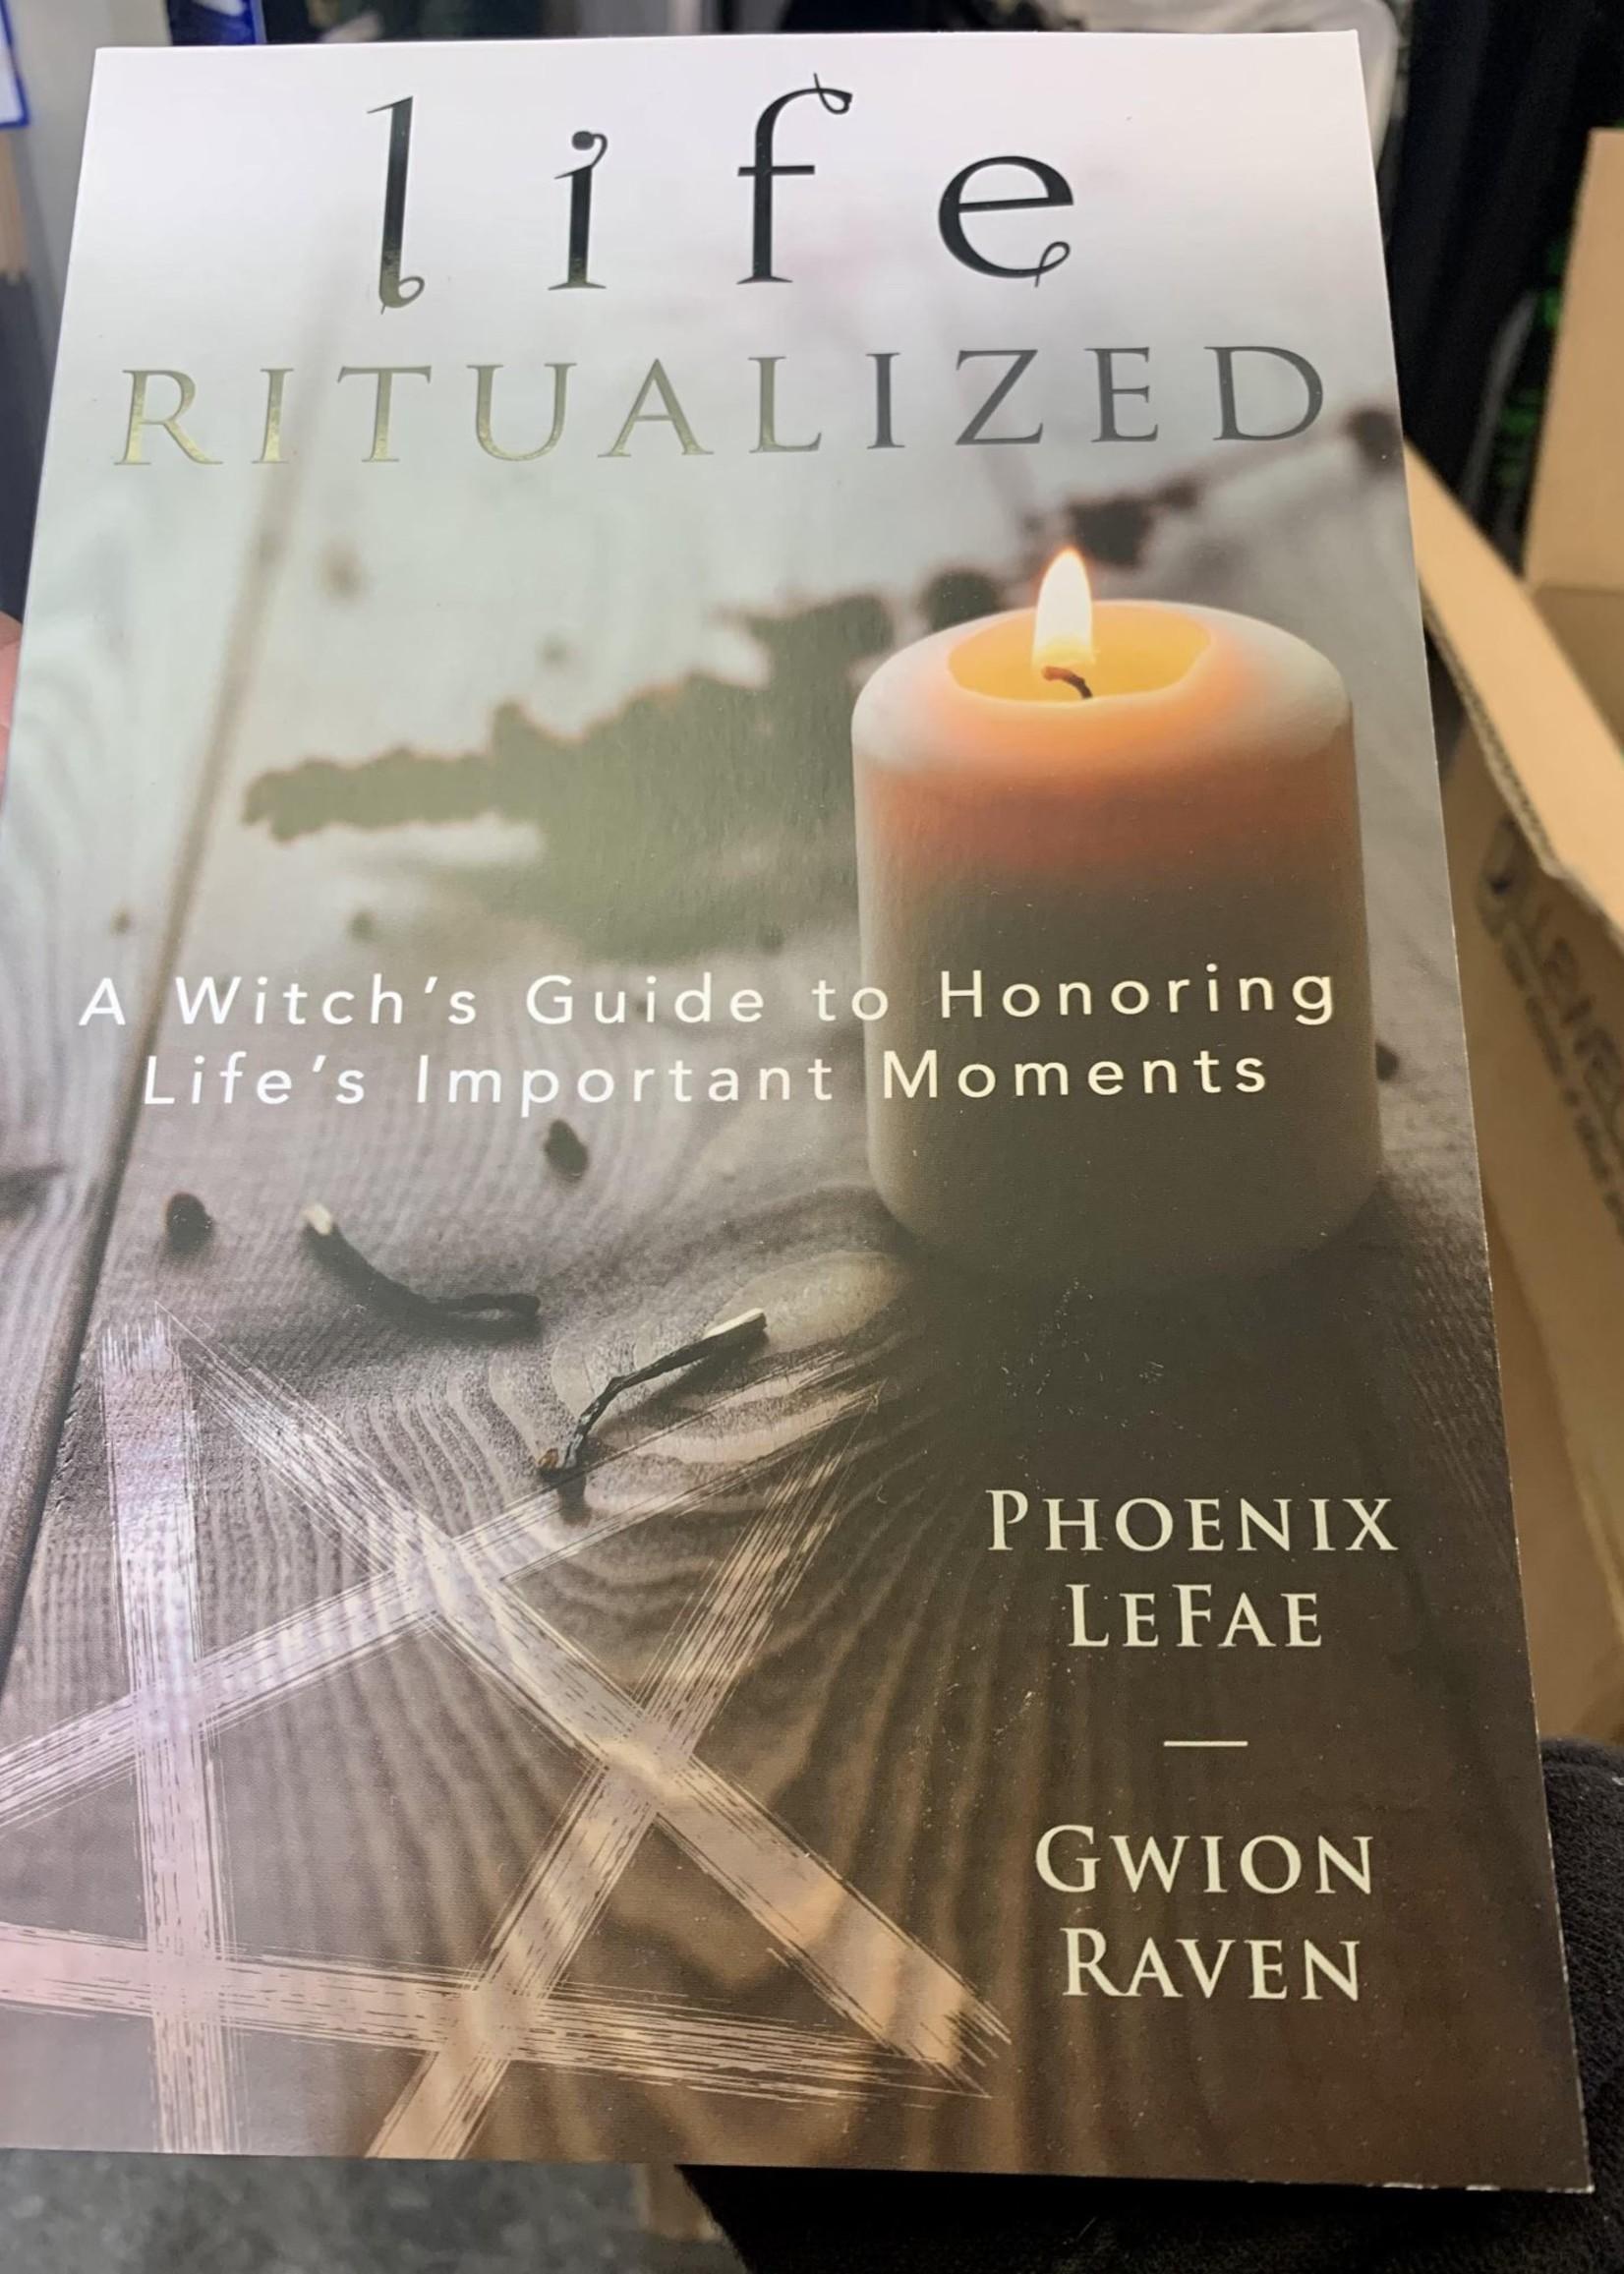 Life Ritualized -  BY PHOENIX LEFAE, GWION RAVEN